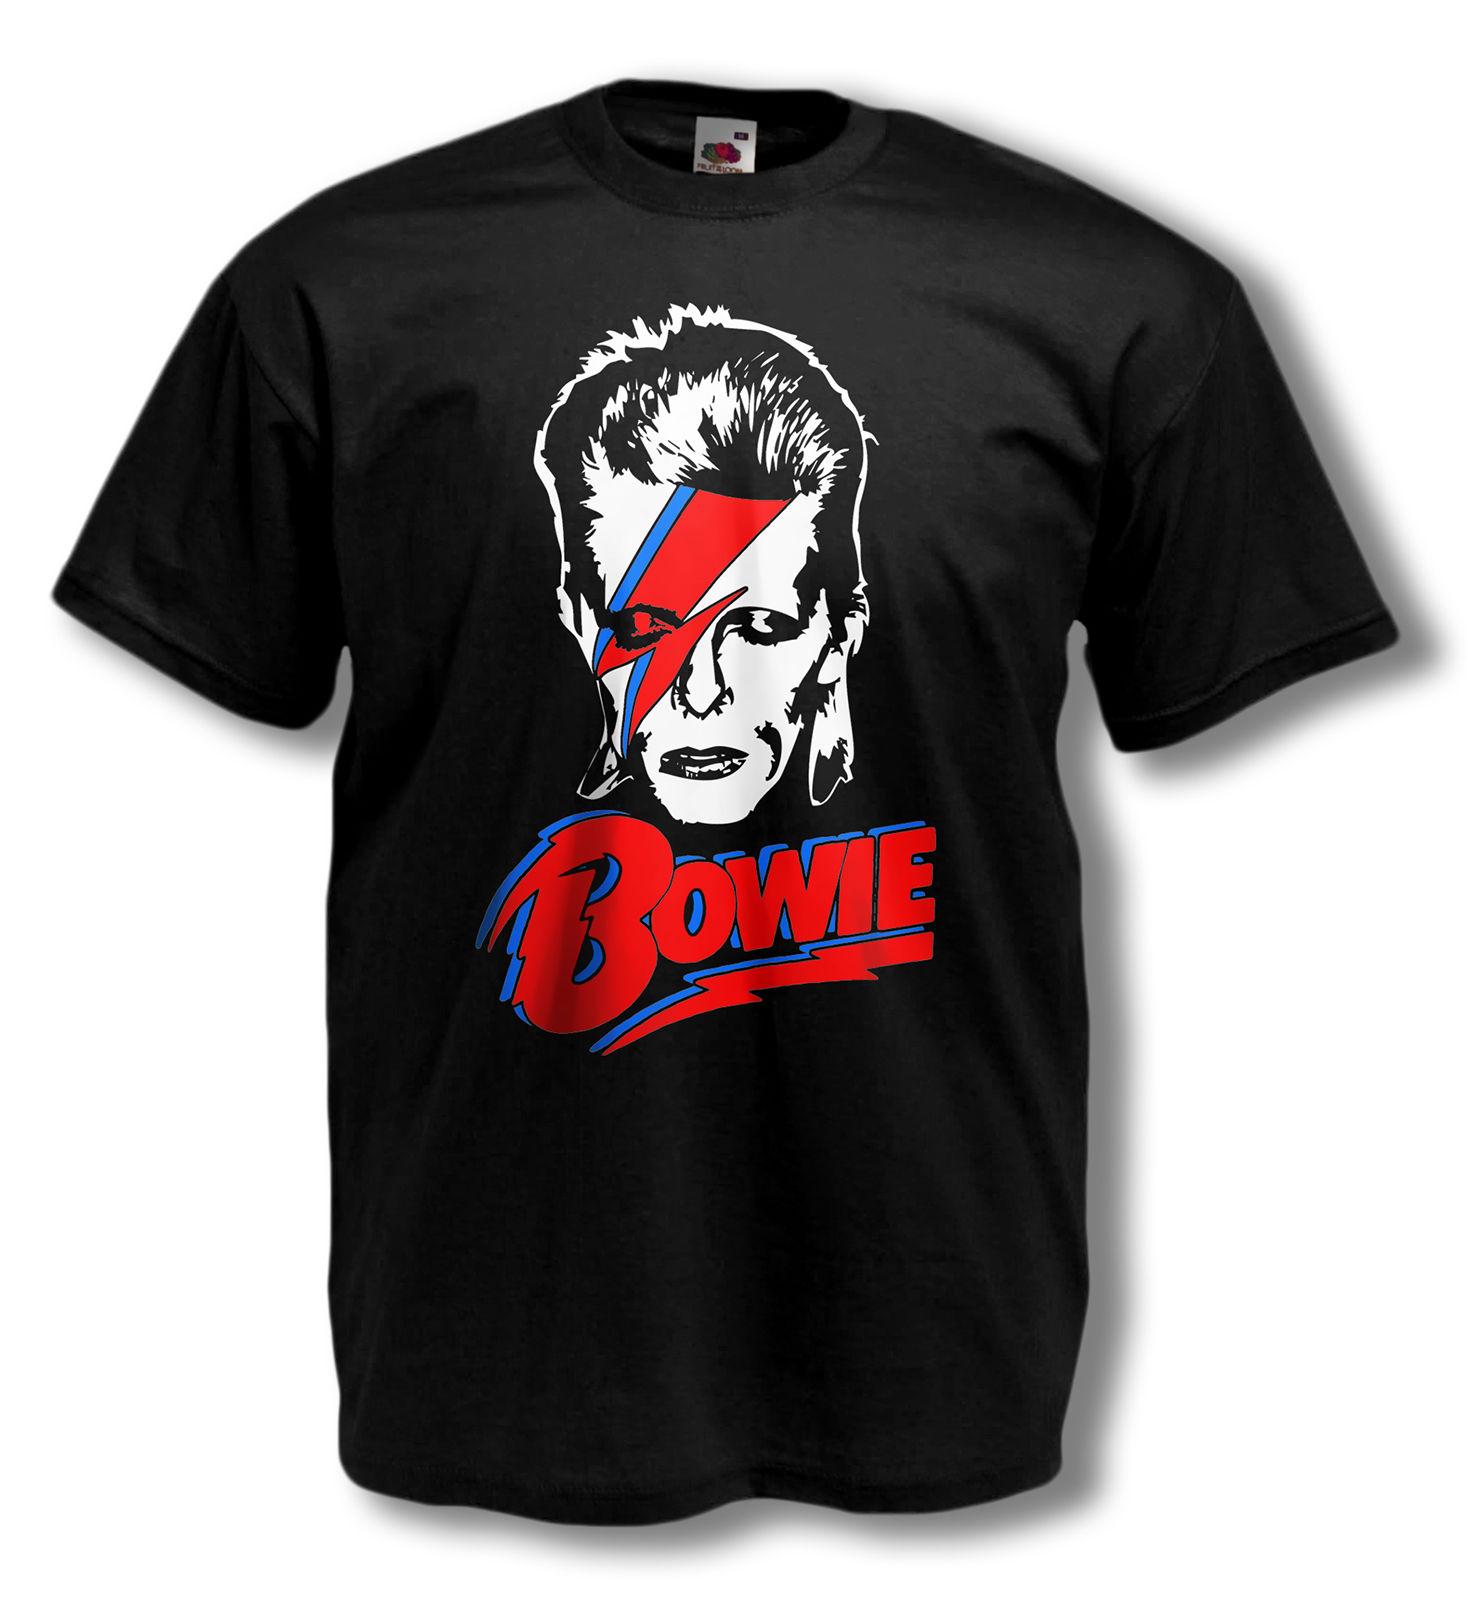 David Bowie T-shirt ALADDIN SANE bowie tribute tshirt JEAN GENIE mens ALL SIZES Summer Casual Man T Shirt Good Quality top tee